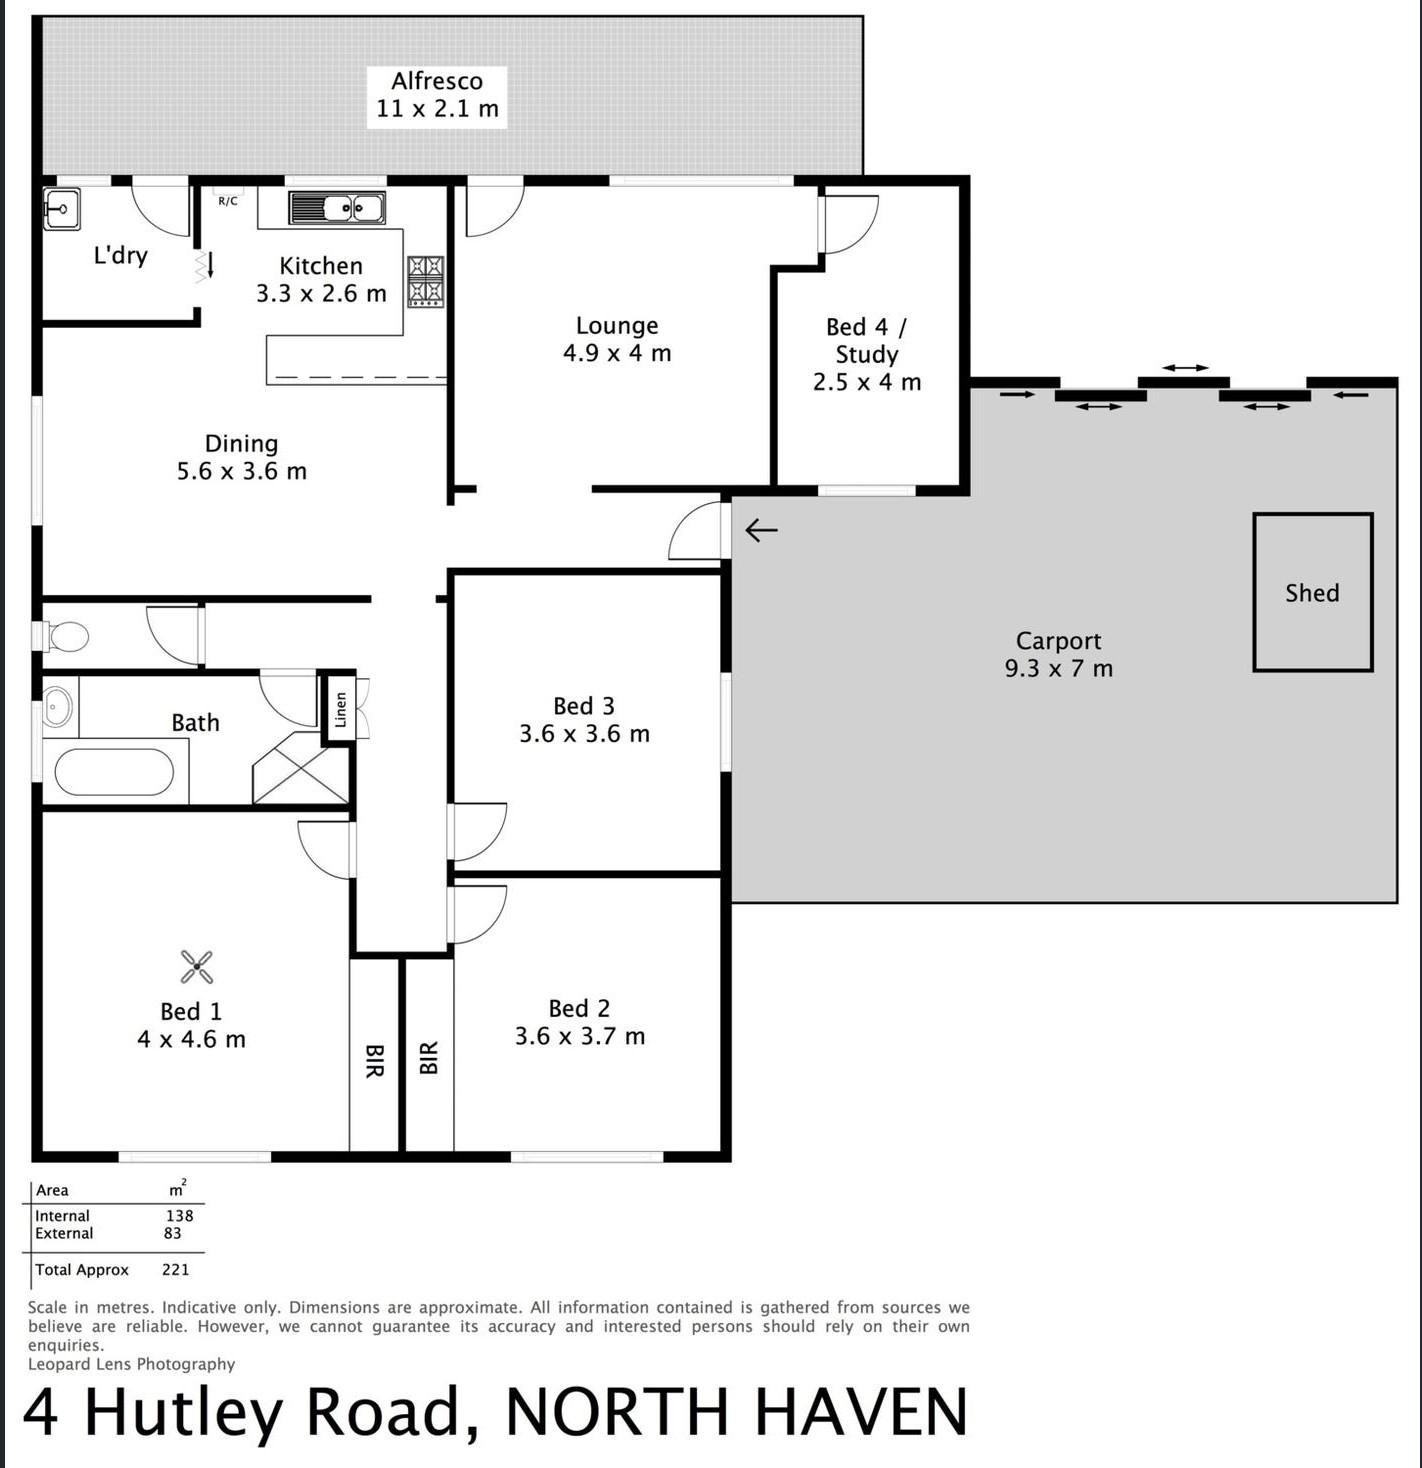 29015733__1620790336-11673-floorplan1.jpg